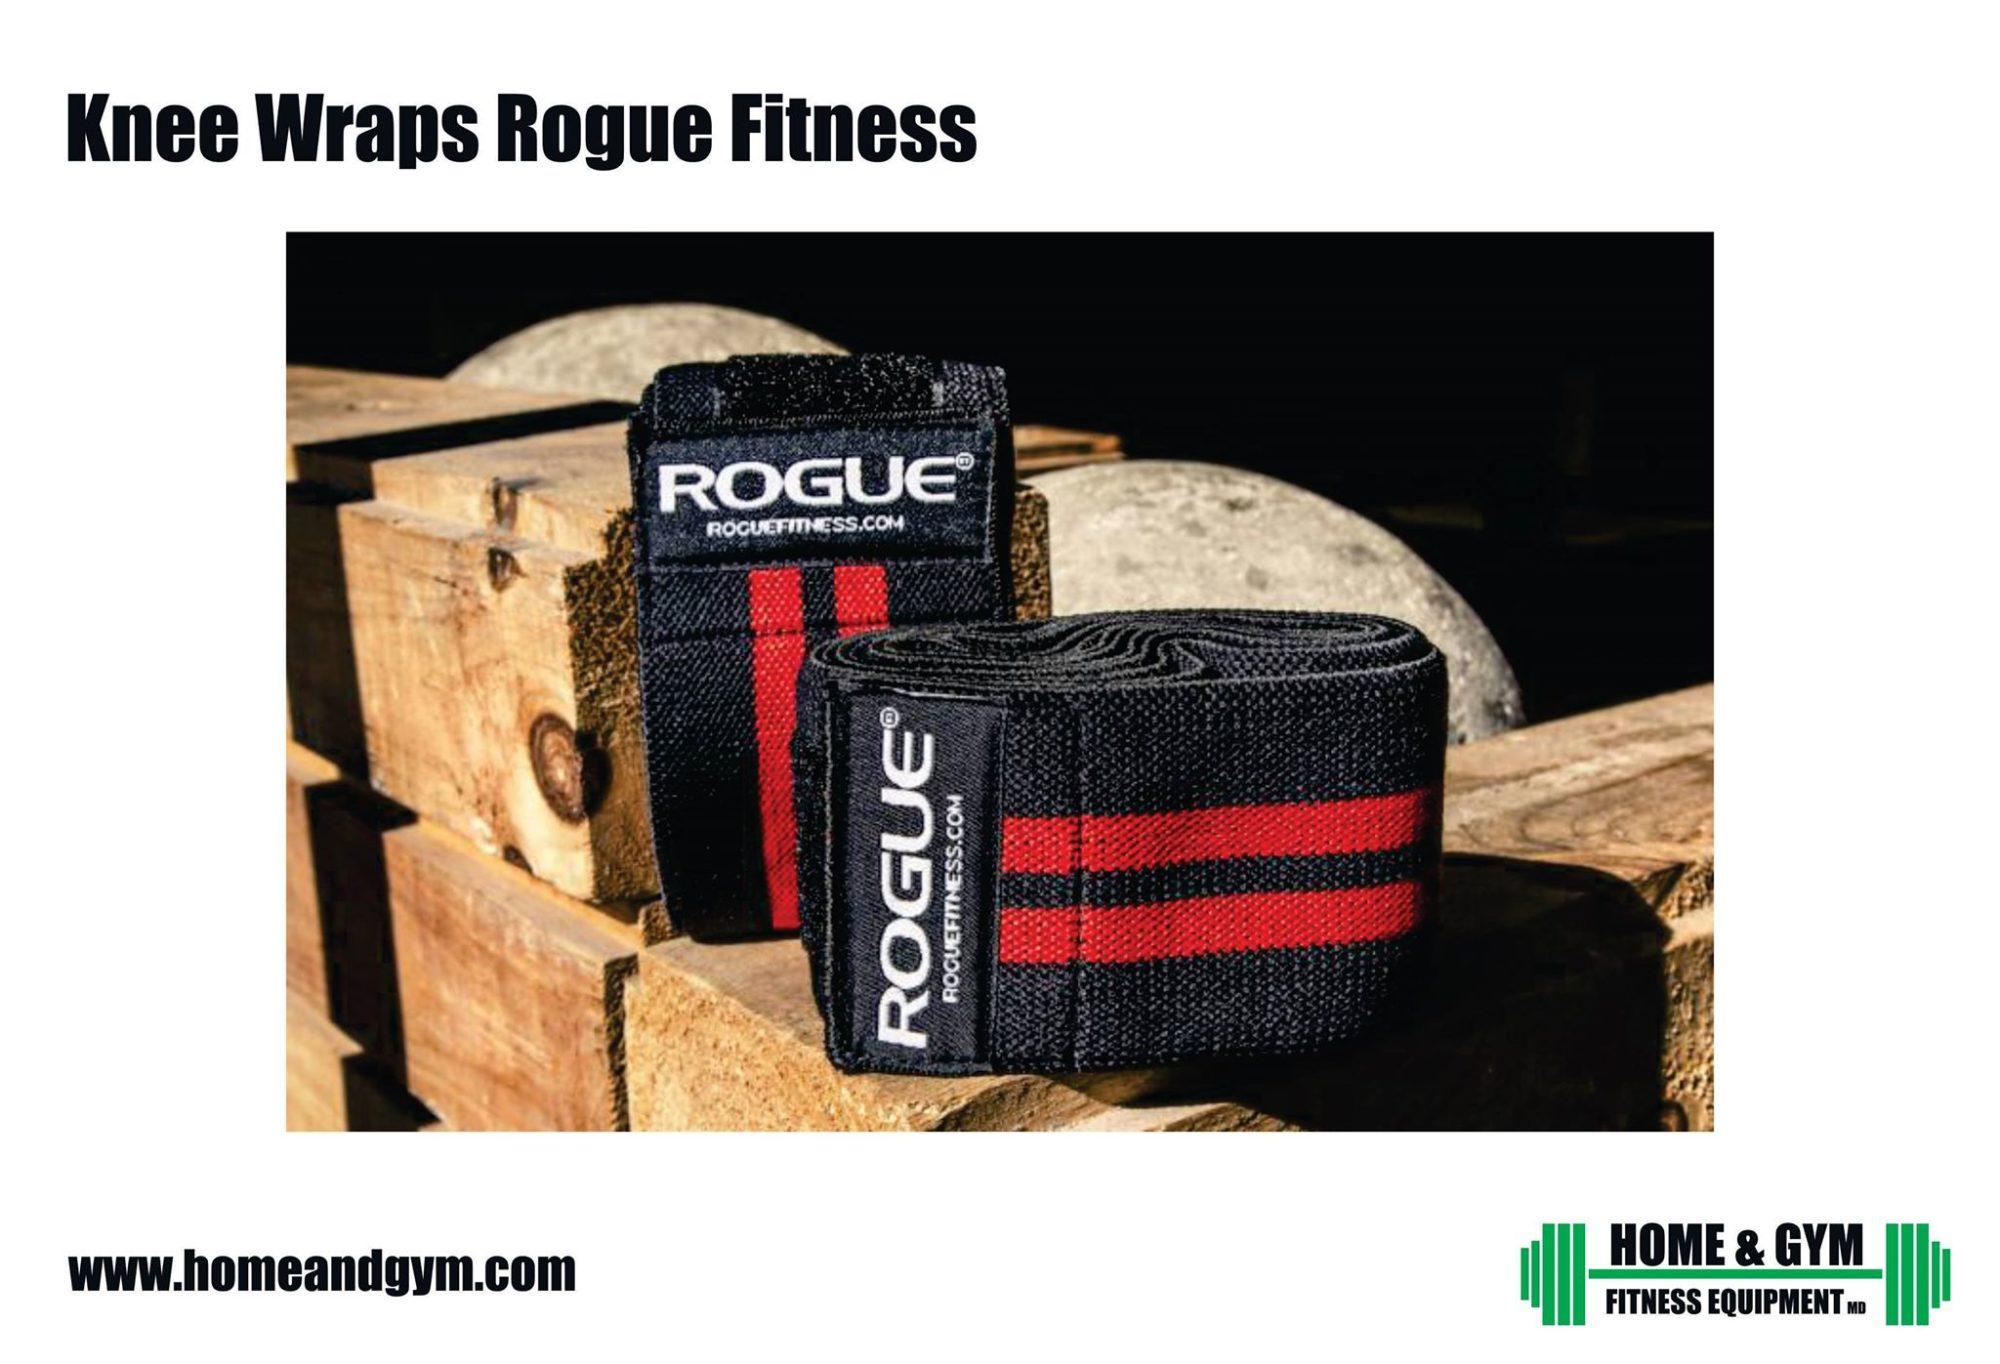 Rodilleras Rogue Fitness